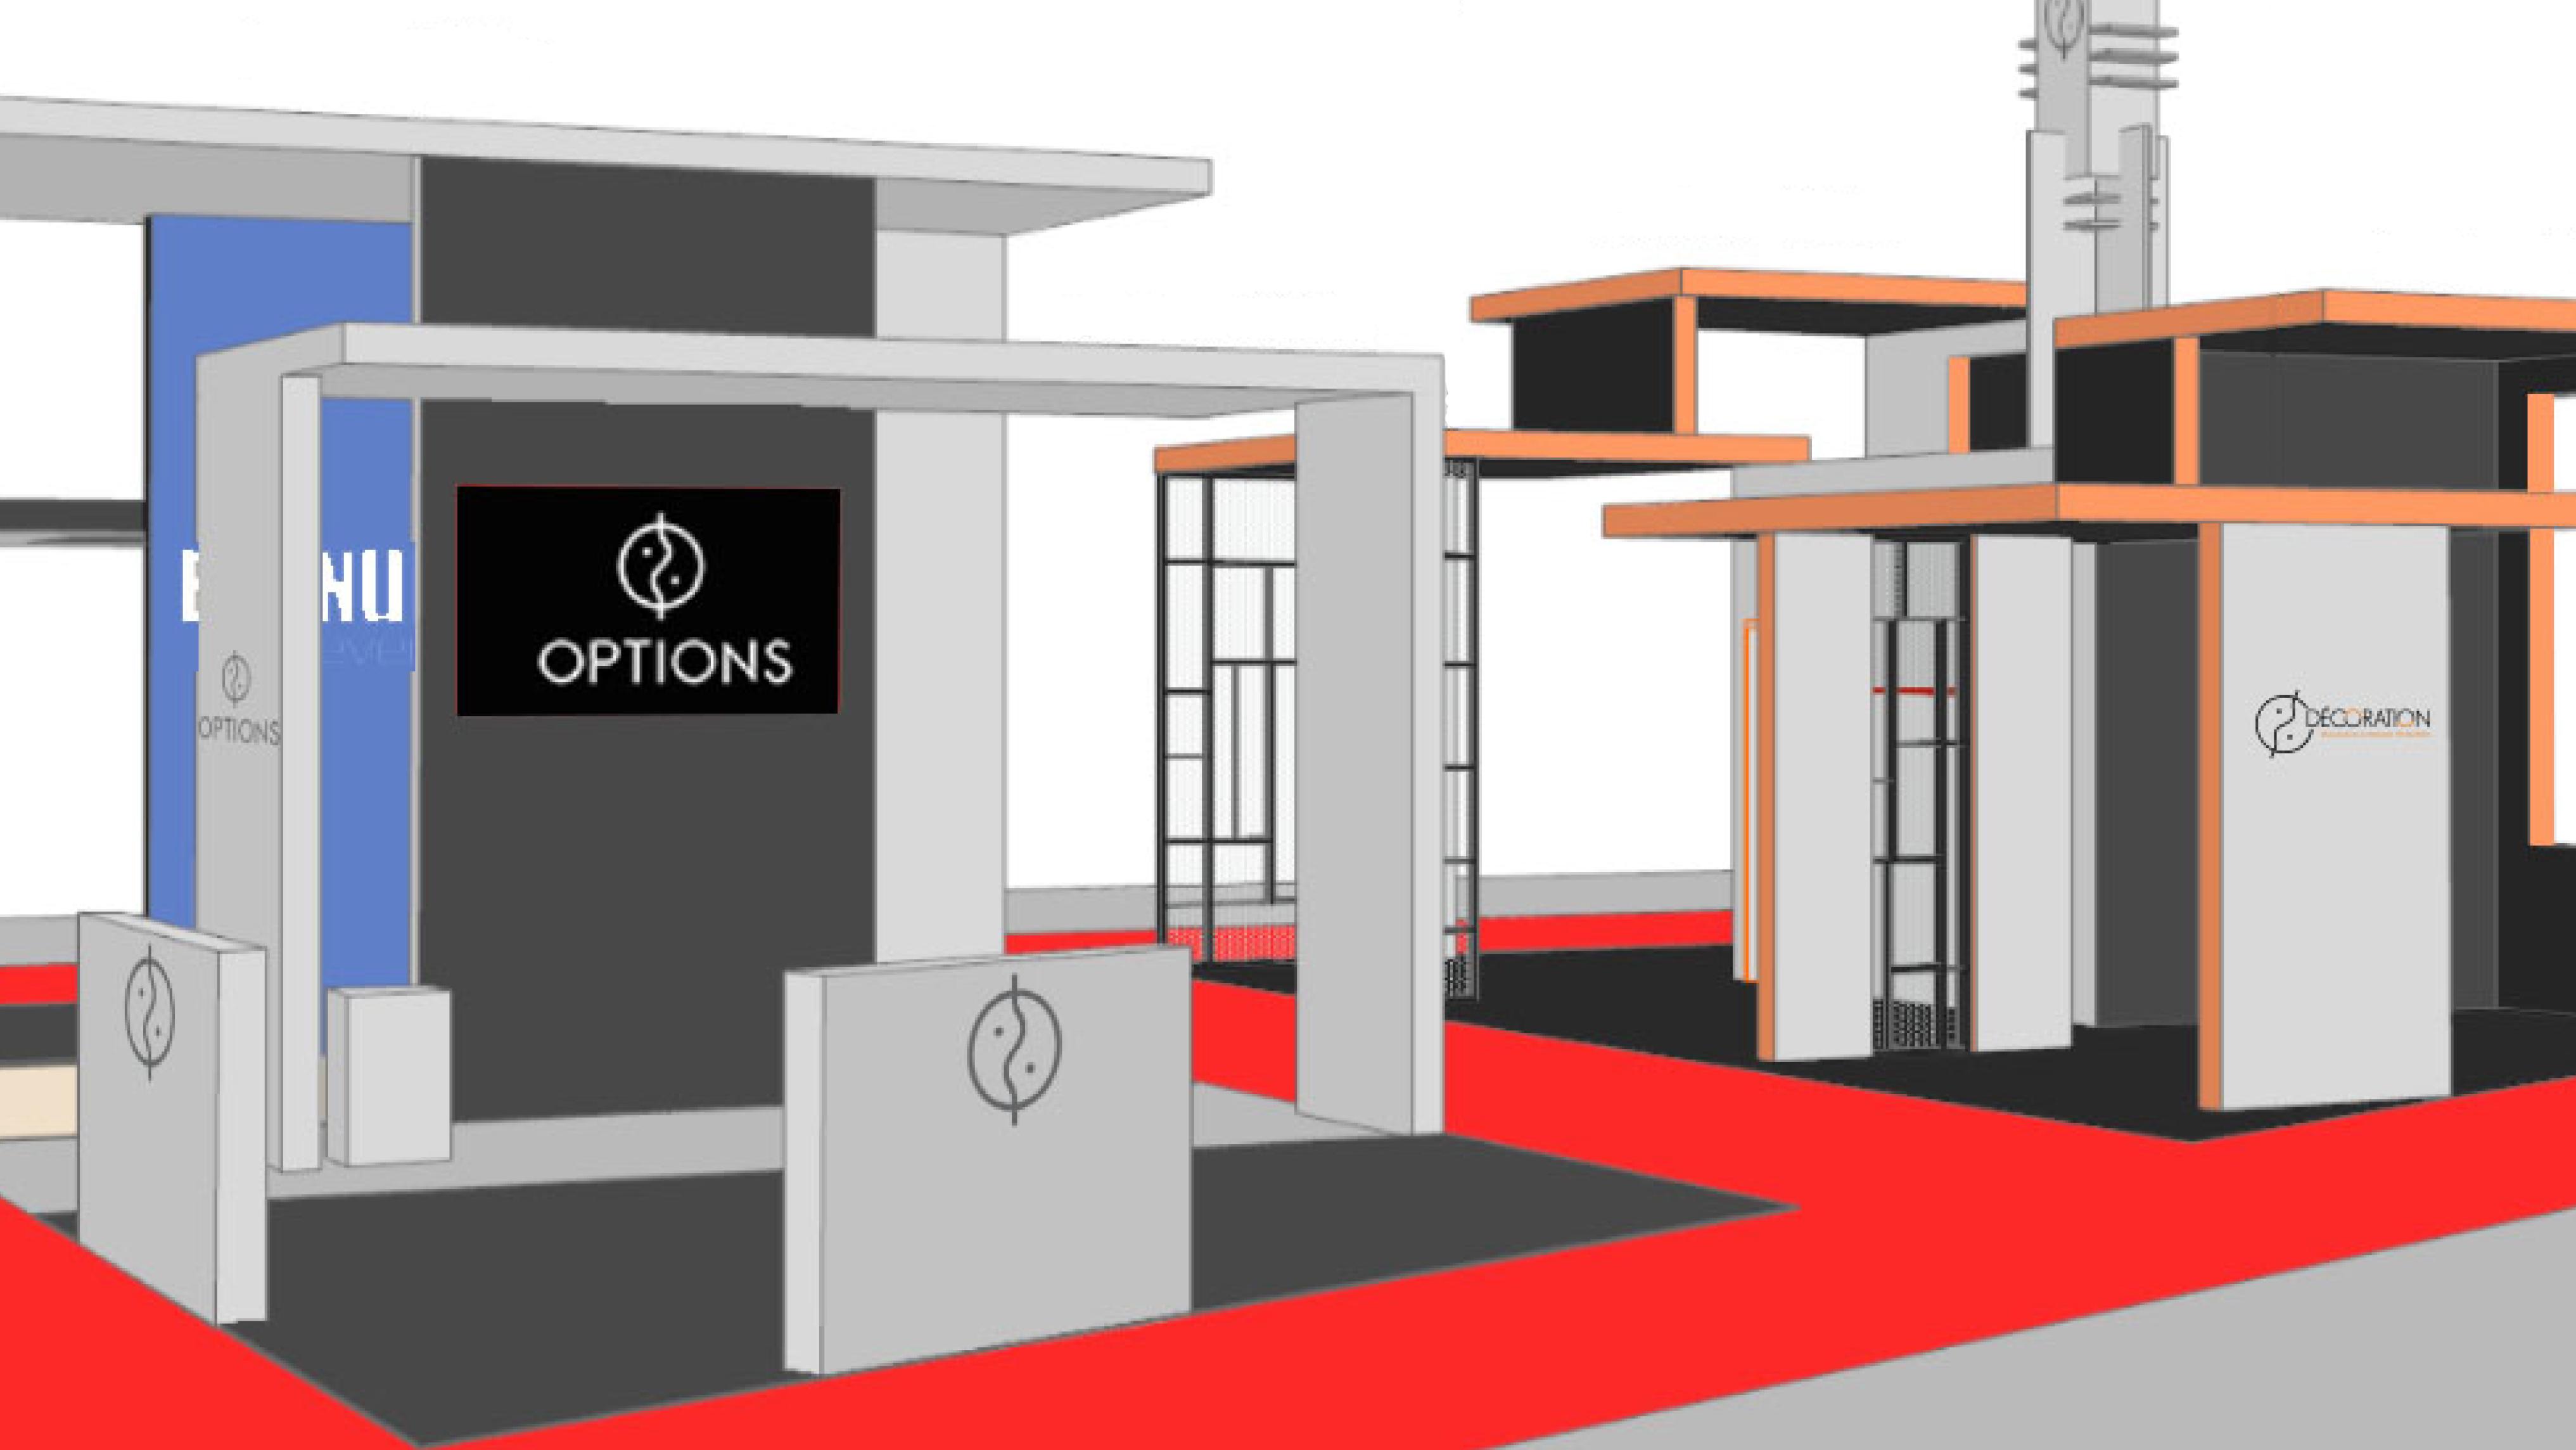 heavent paris options d coration. Black Bedroom Furniture Sets. Home Design Ideas